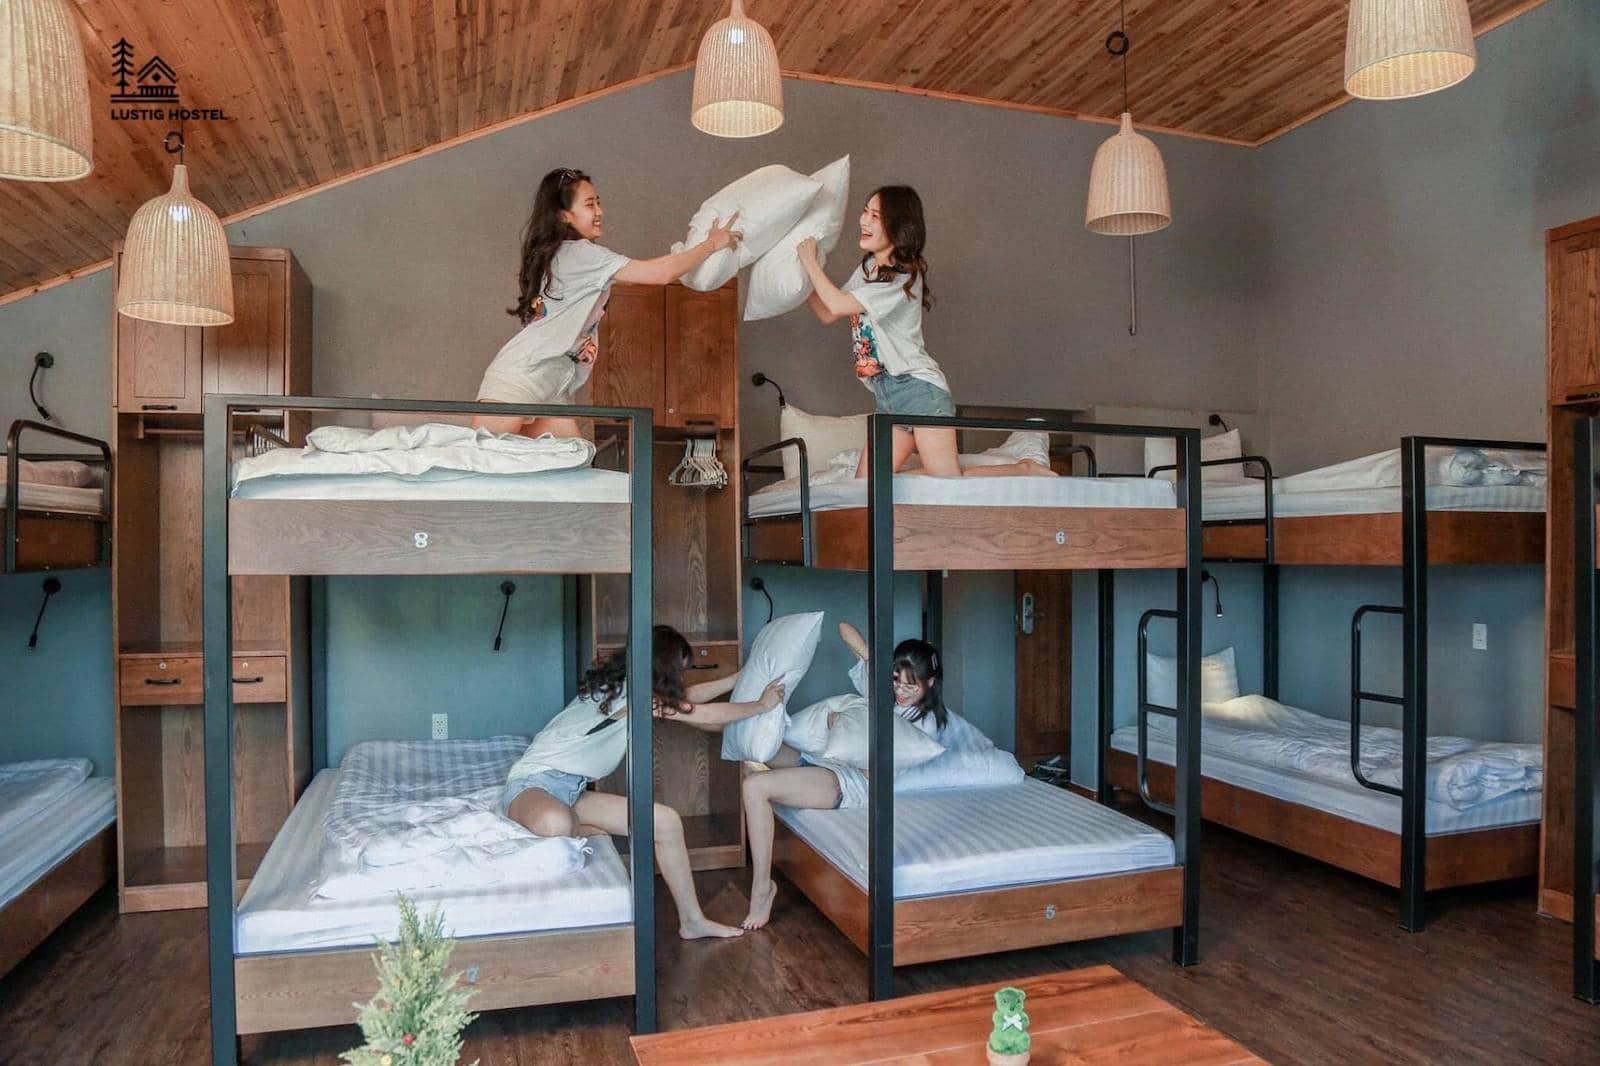 Image of girls having a pillow fight at Lustig Hostel in Sapa Vietnam